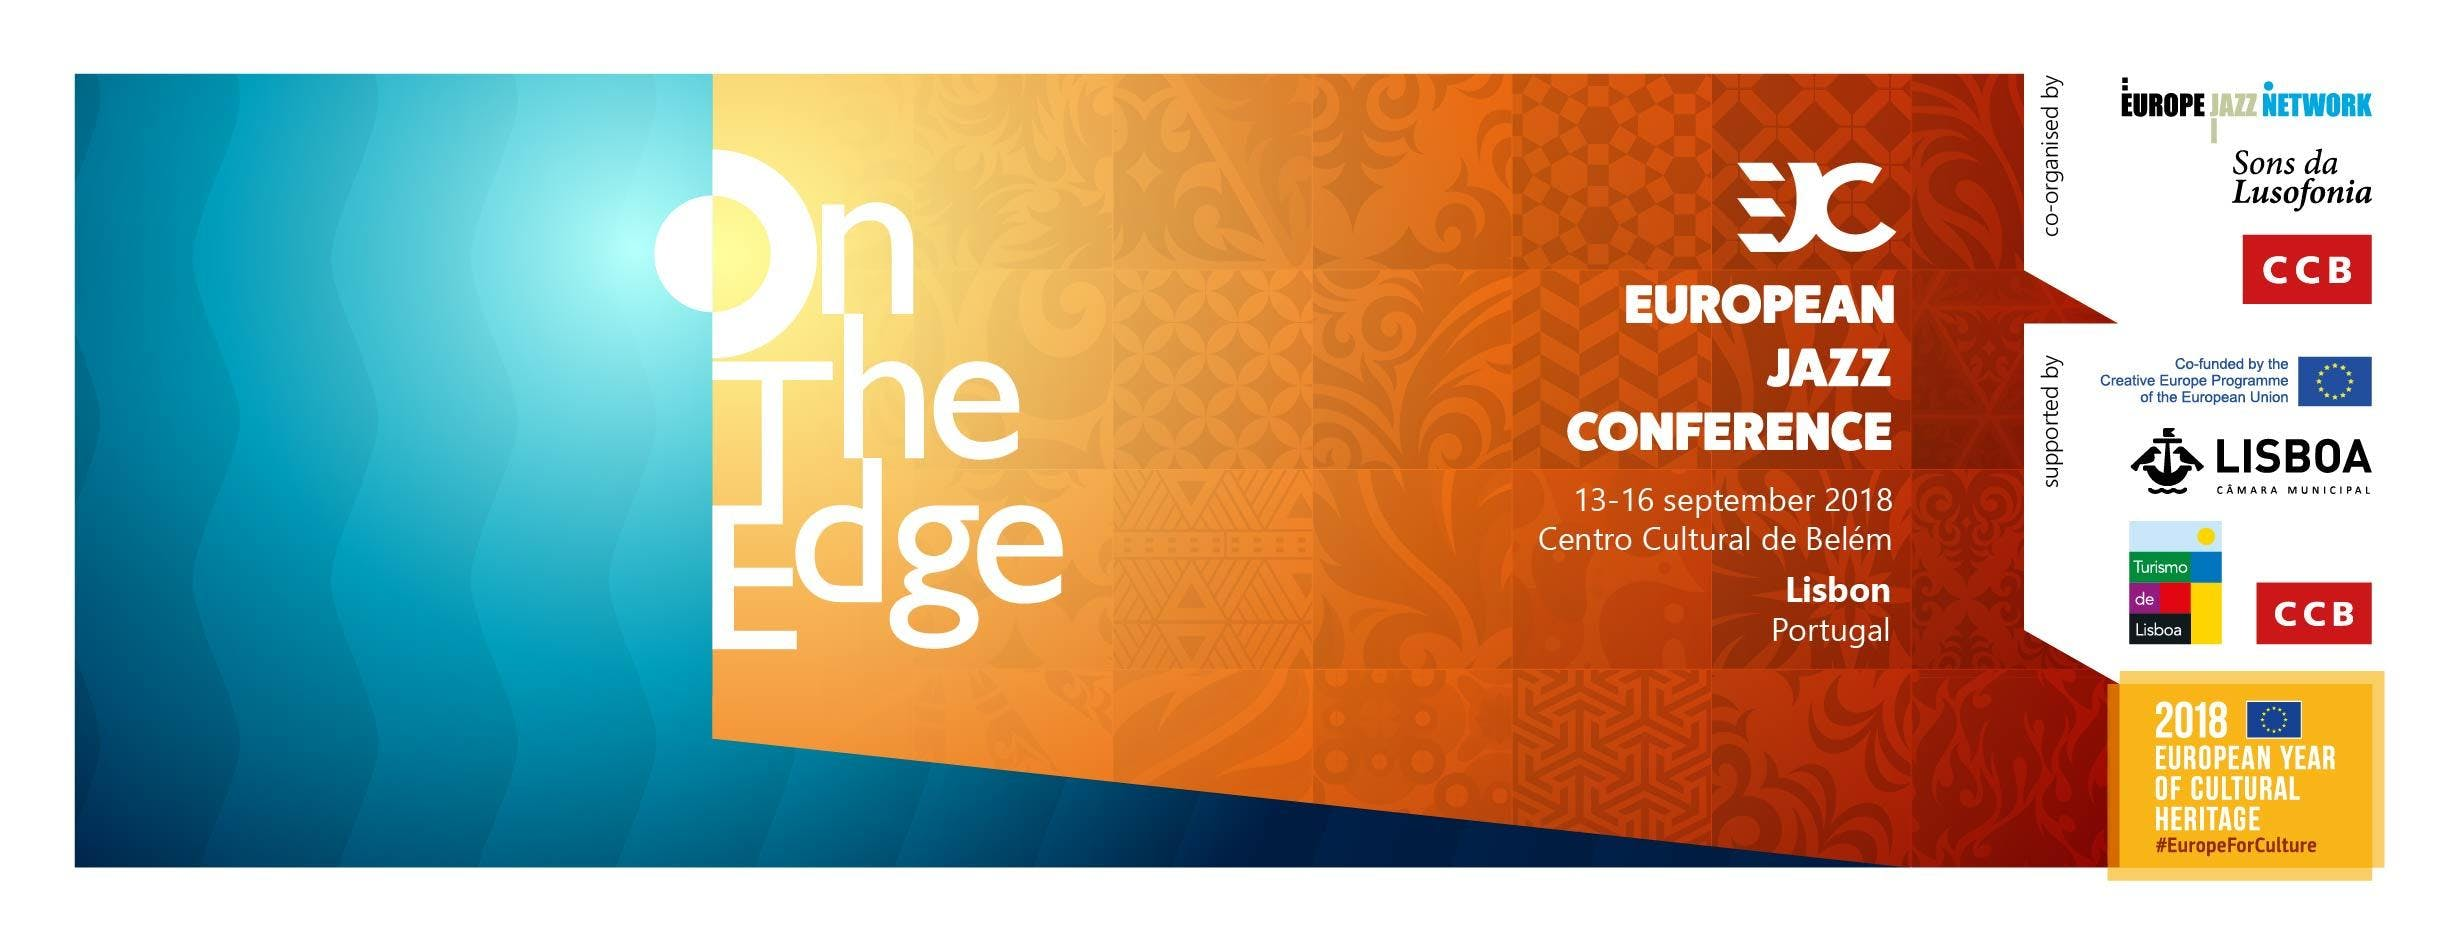 European Jazz Conference Lisbon 2018